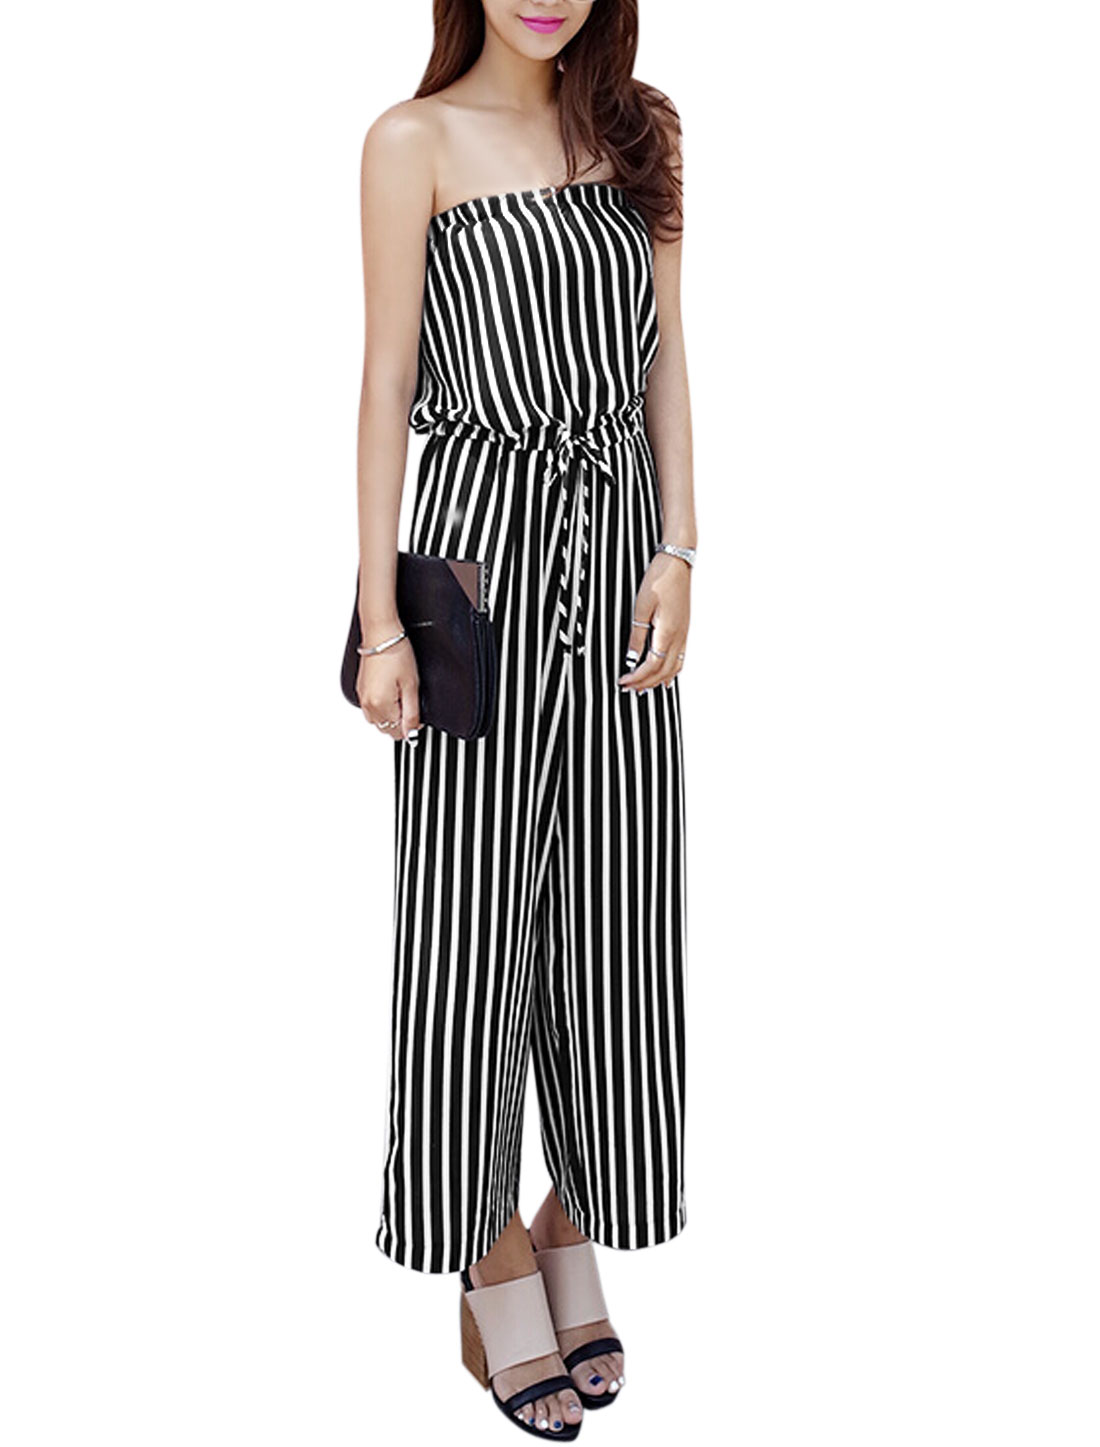 Ladies Sleeveless Stripes Print Elastic Waist Wide Leg Casual Jumpsuit Black White XS